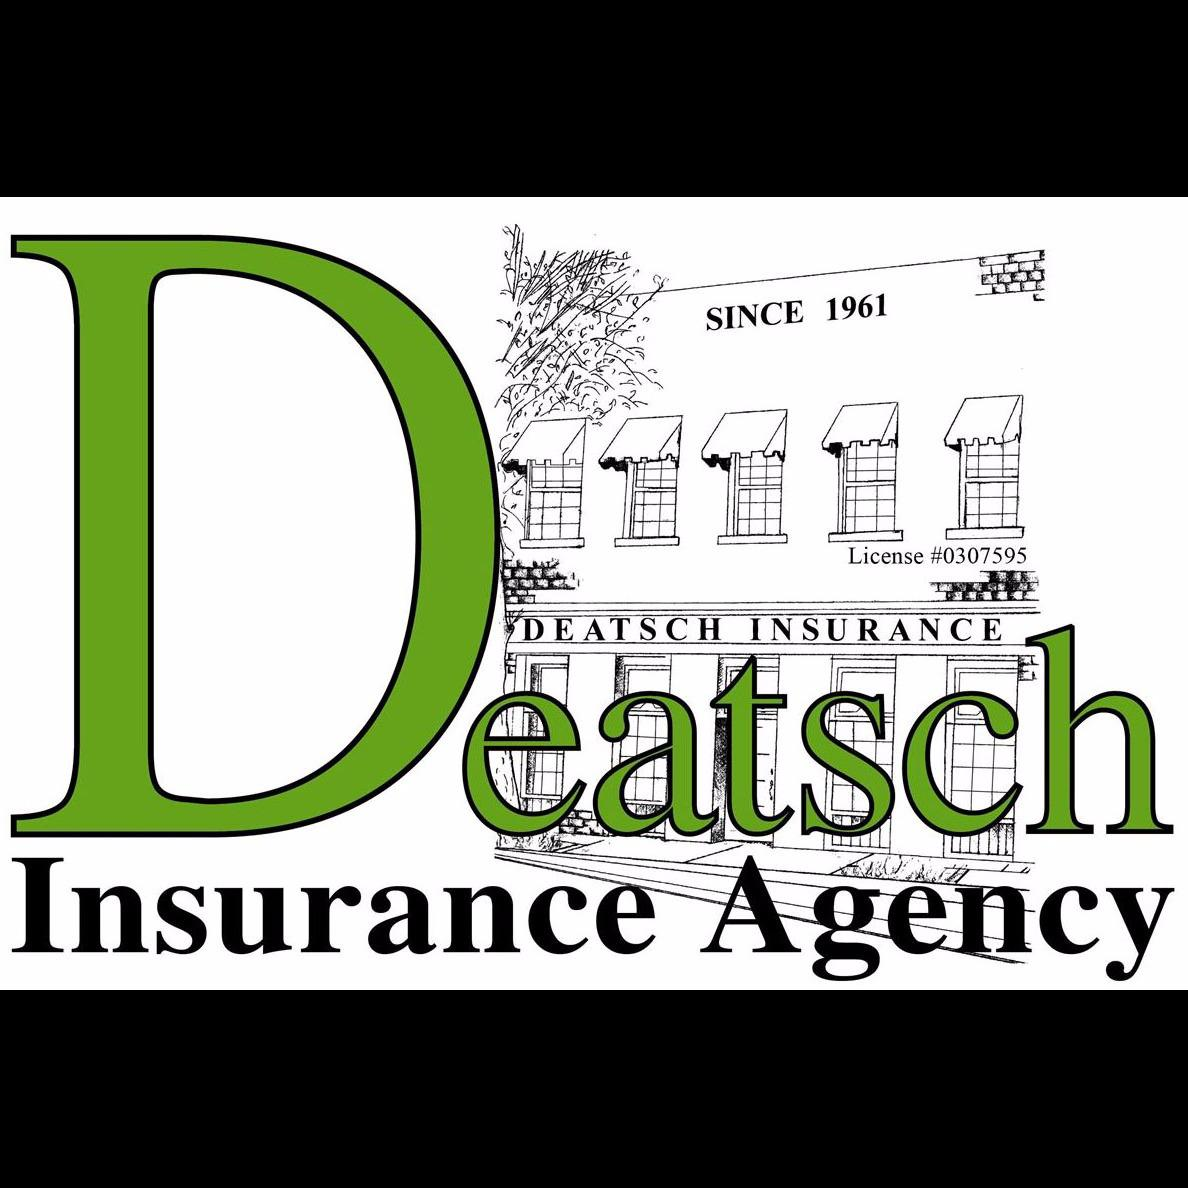 Deatsch Insurance Agency